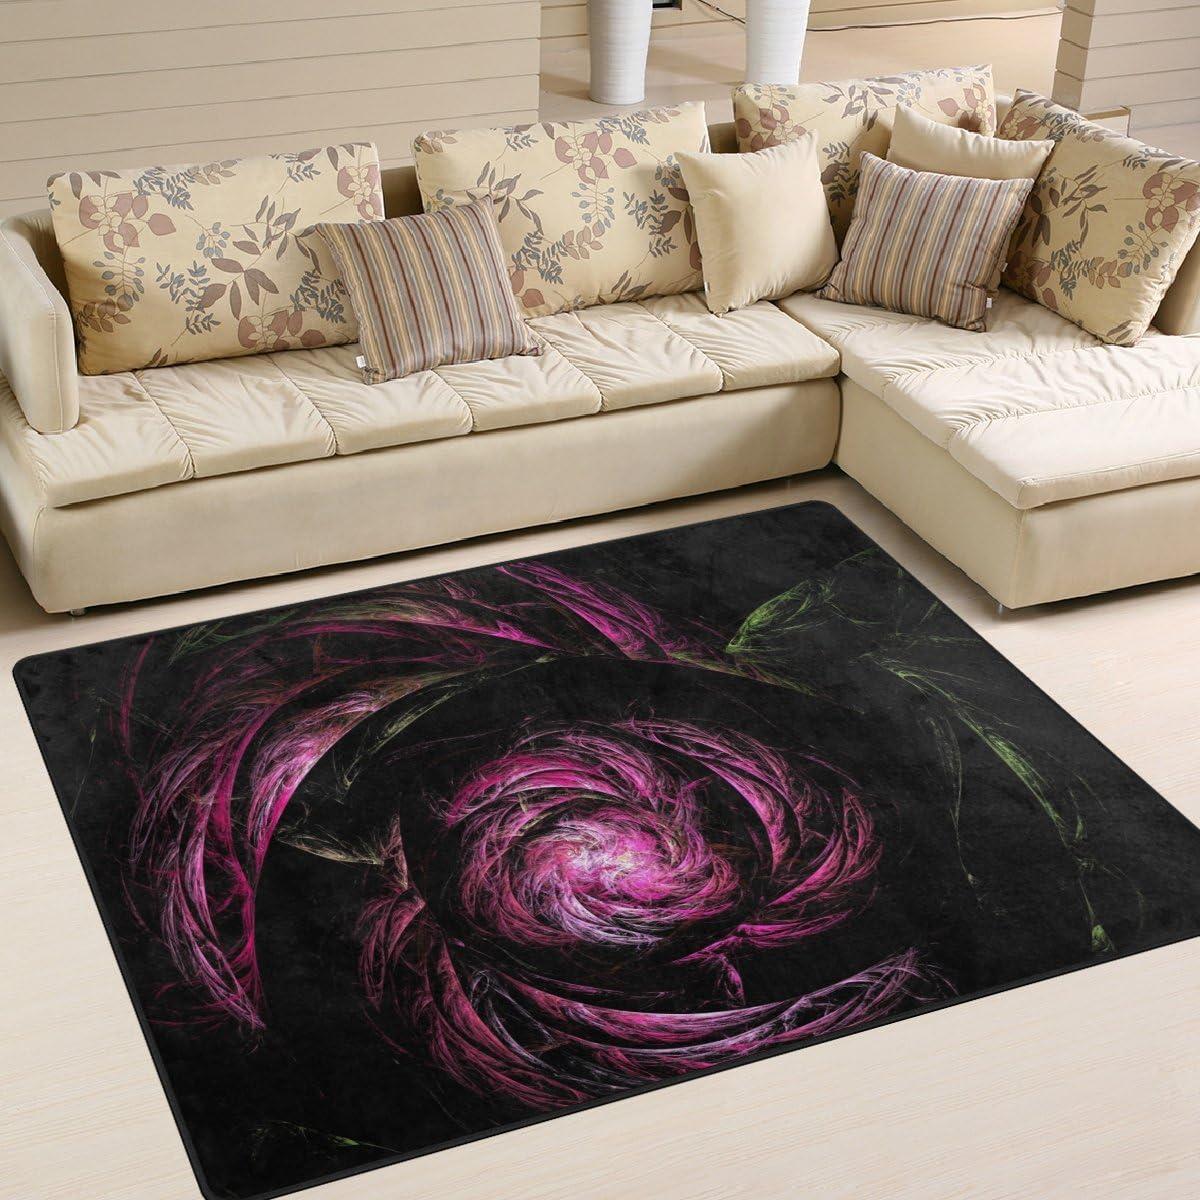 SAVSV Fractal Rose Printed Large Area Rugs,Lightweight Water-Repellent Floor Carpet for Living Room Bedroom Home Deck Patio,6 8 x 4 10